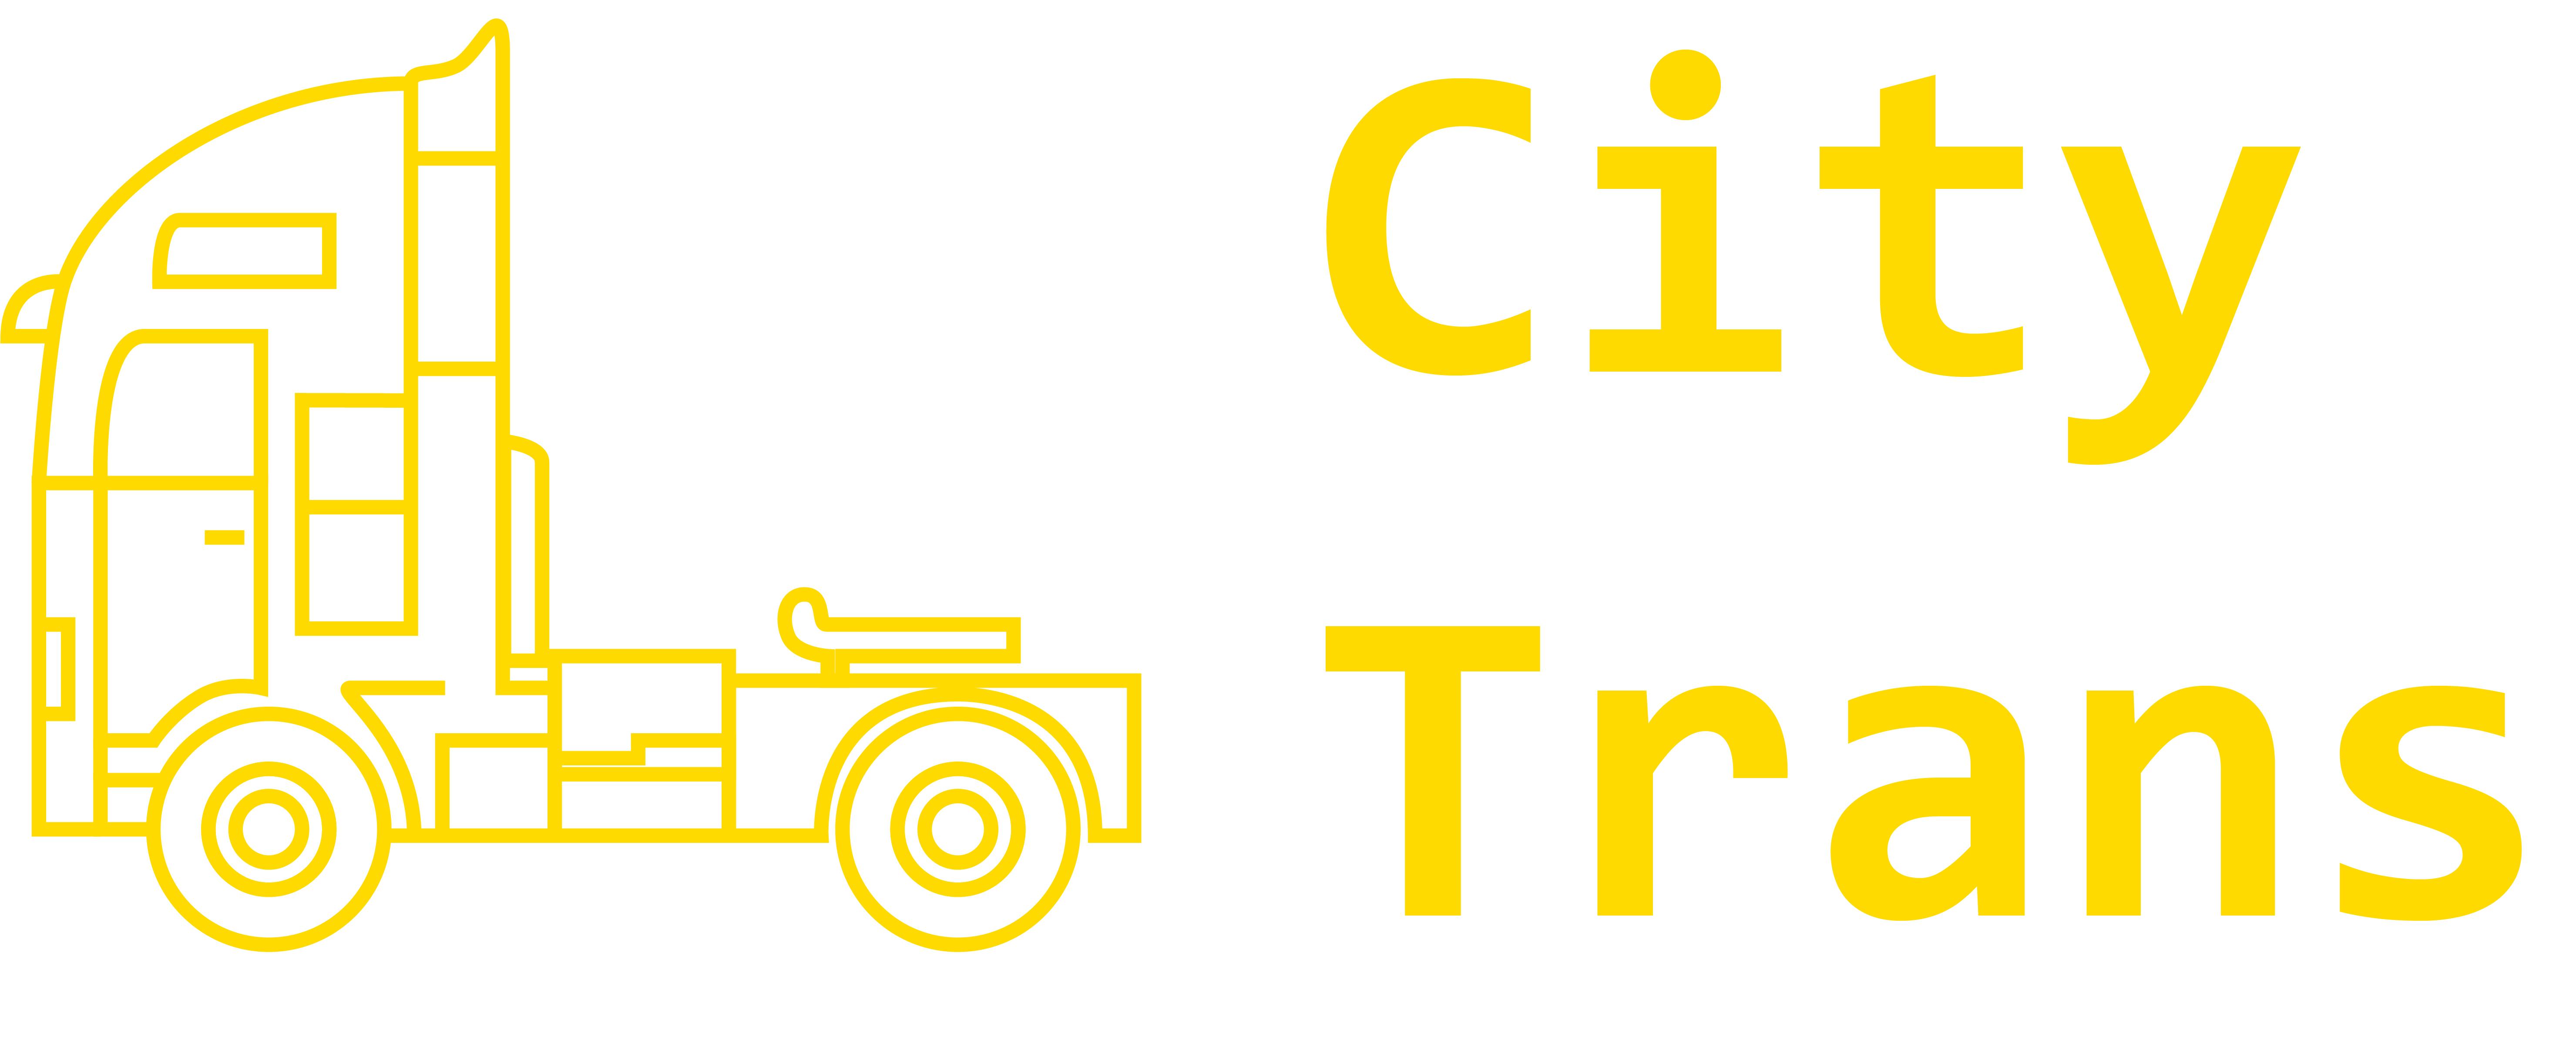 Разработка Логотипа транспортной компании фото f_6915e6d35ee70352.jpg